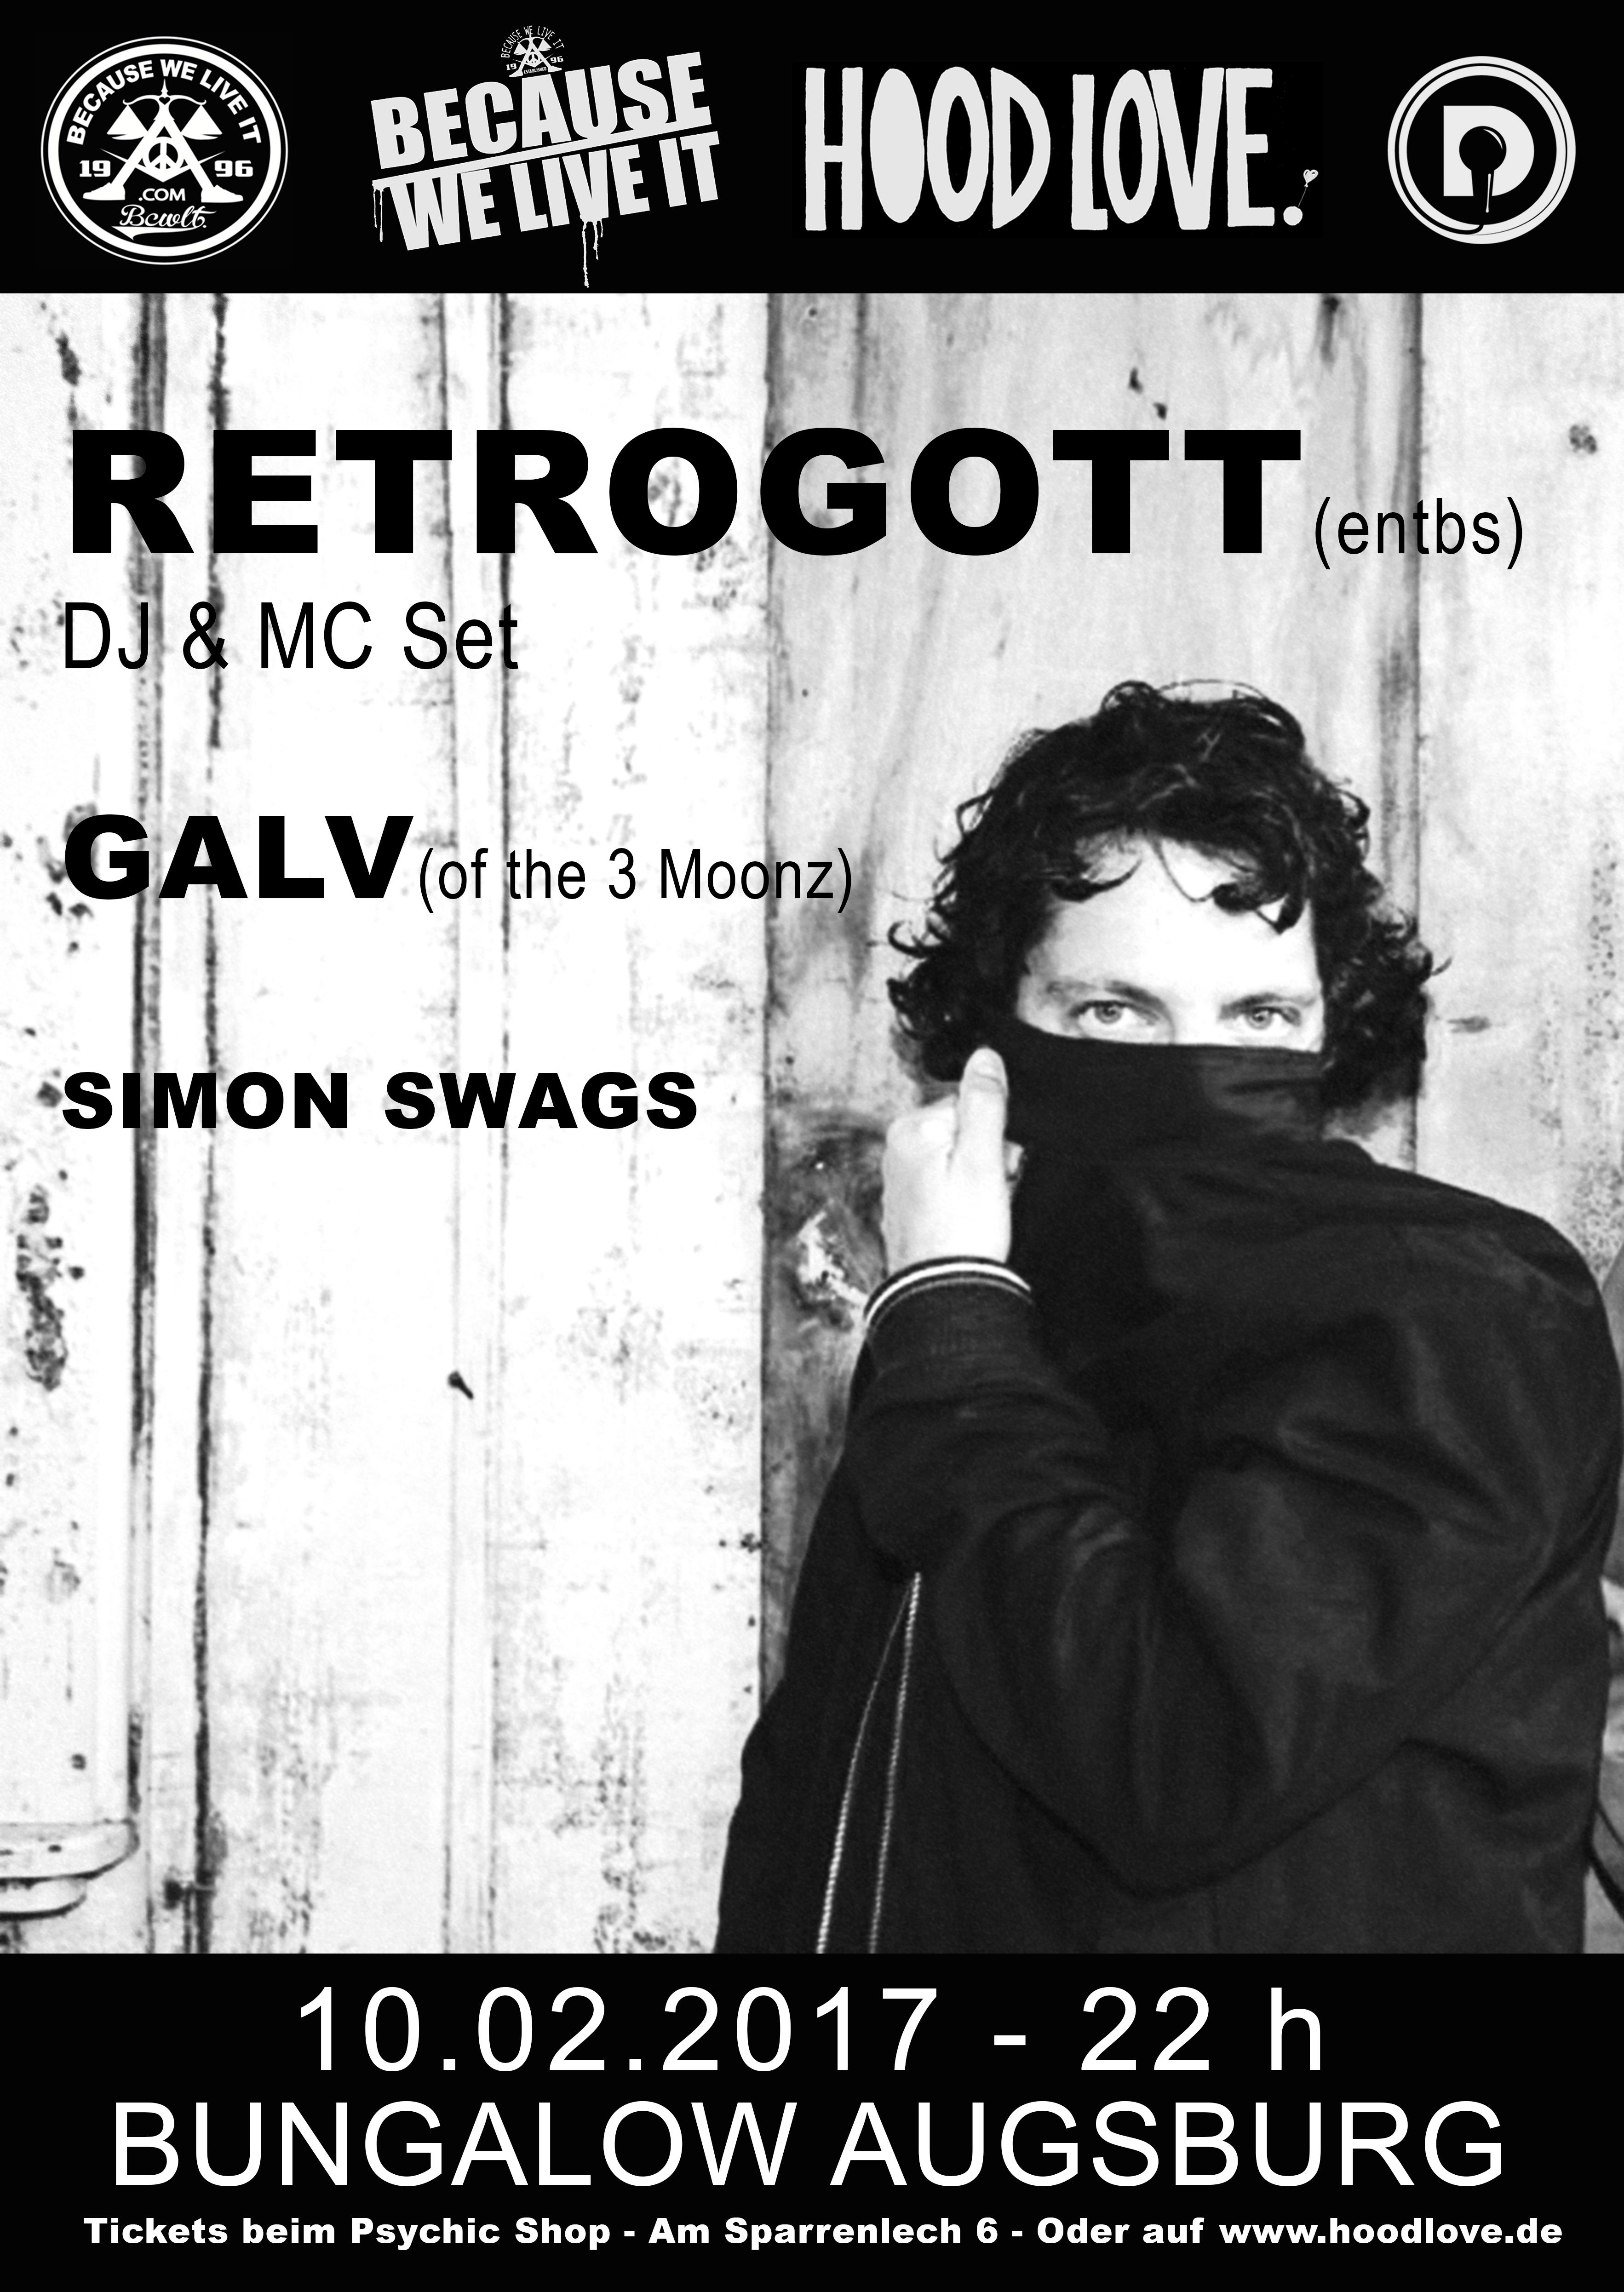 RETROGOTT (DJ & MC Set) & GALV Live @ Bungalow Augsburg // 10.02.2017